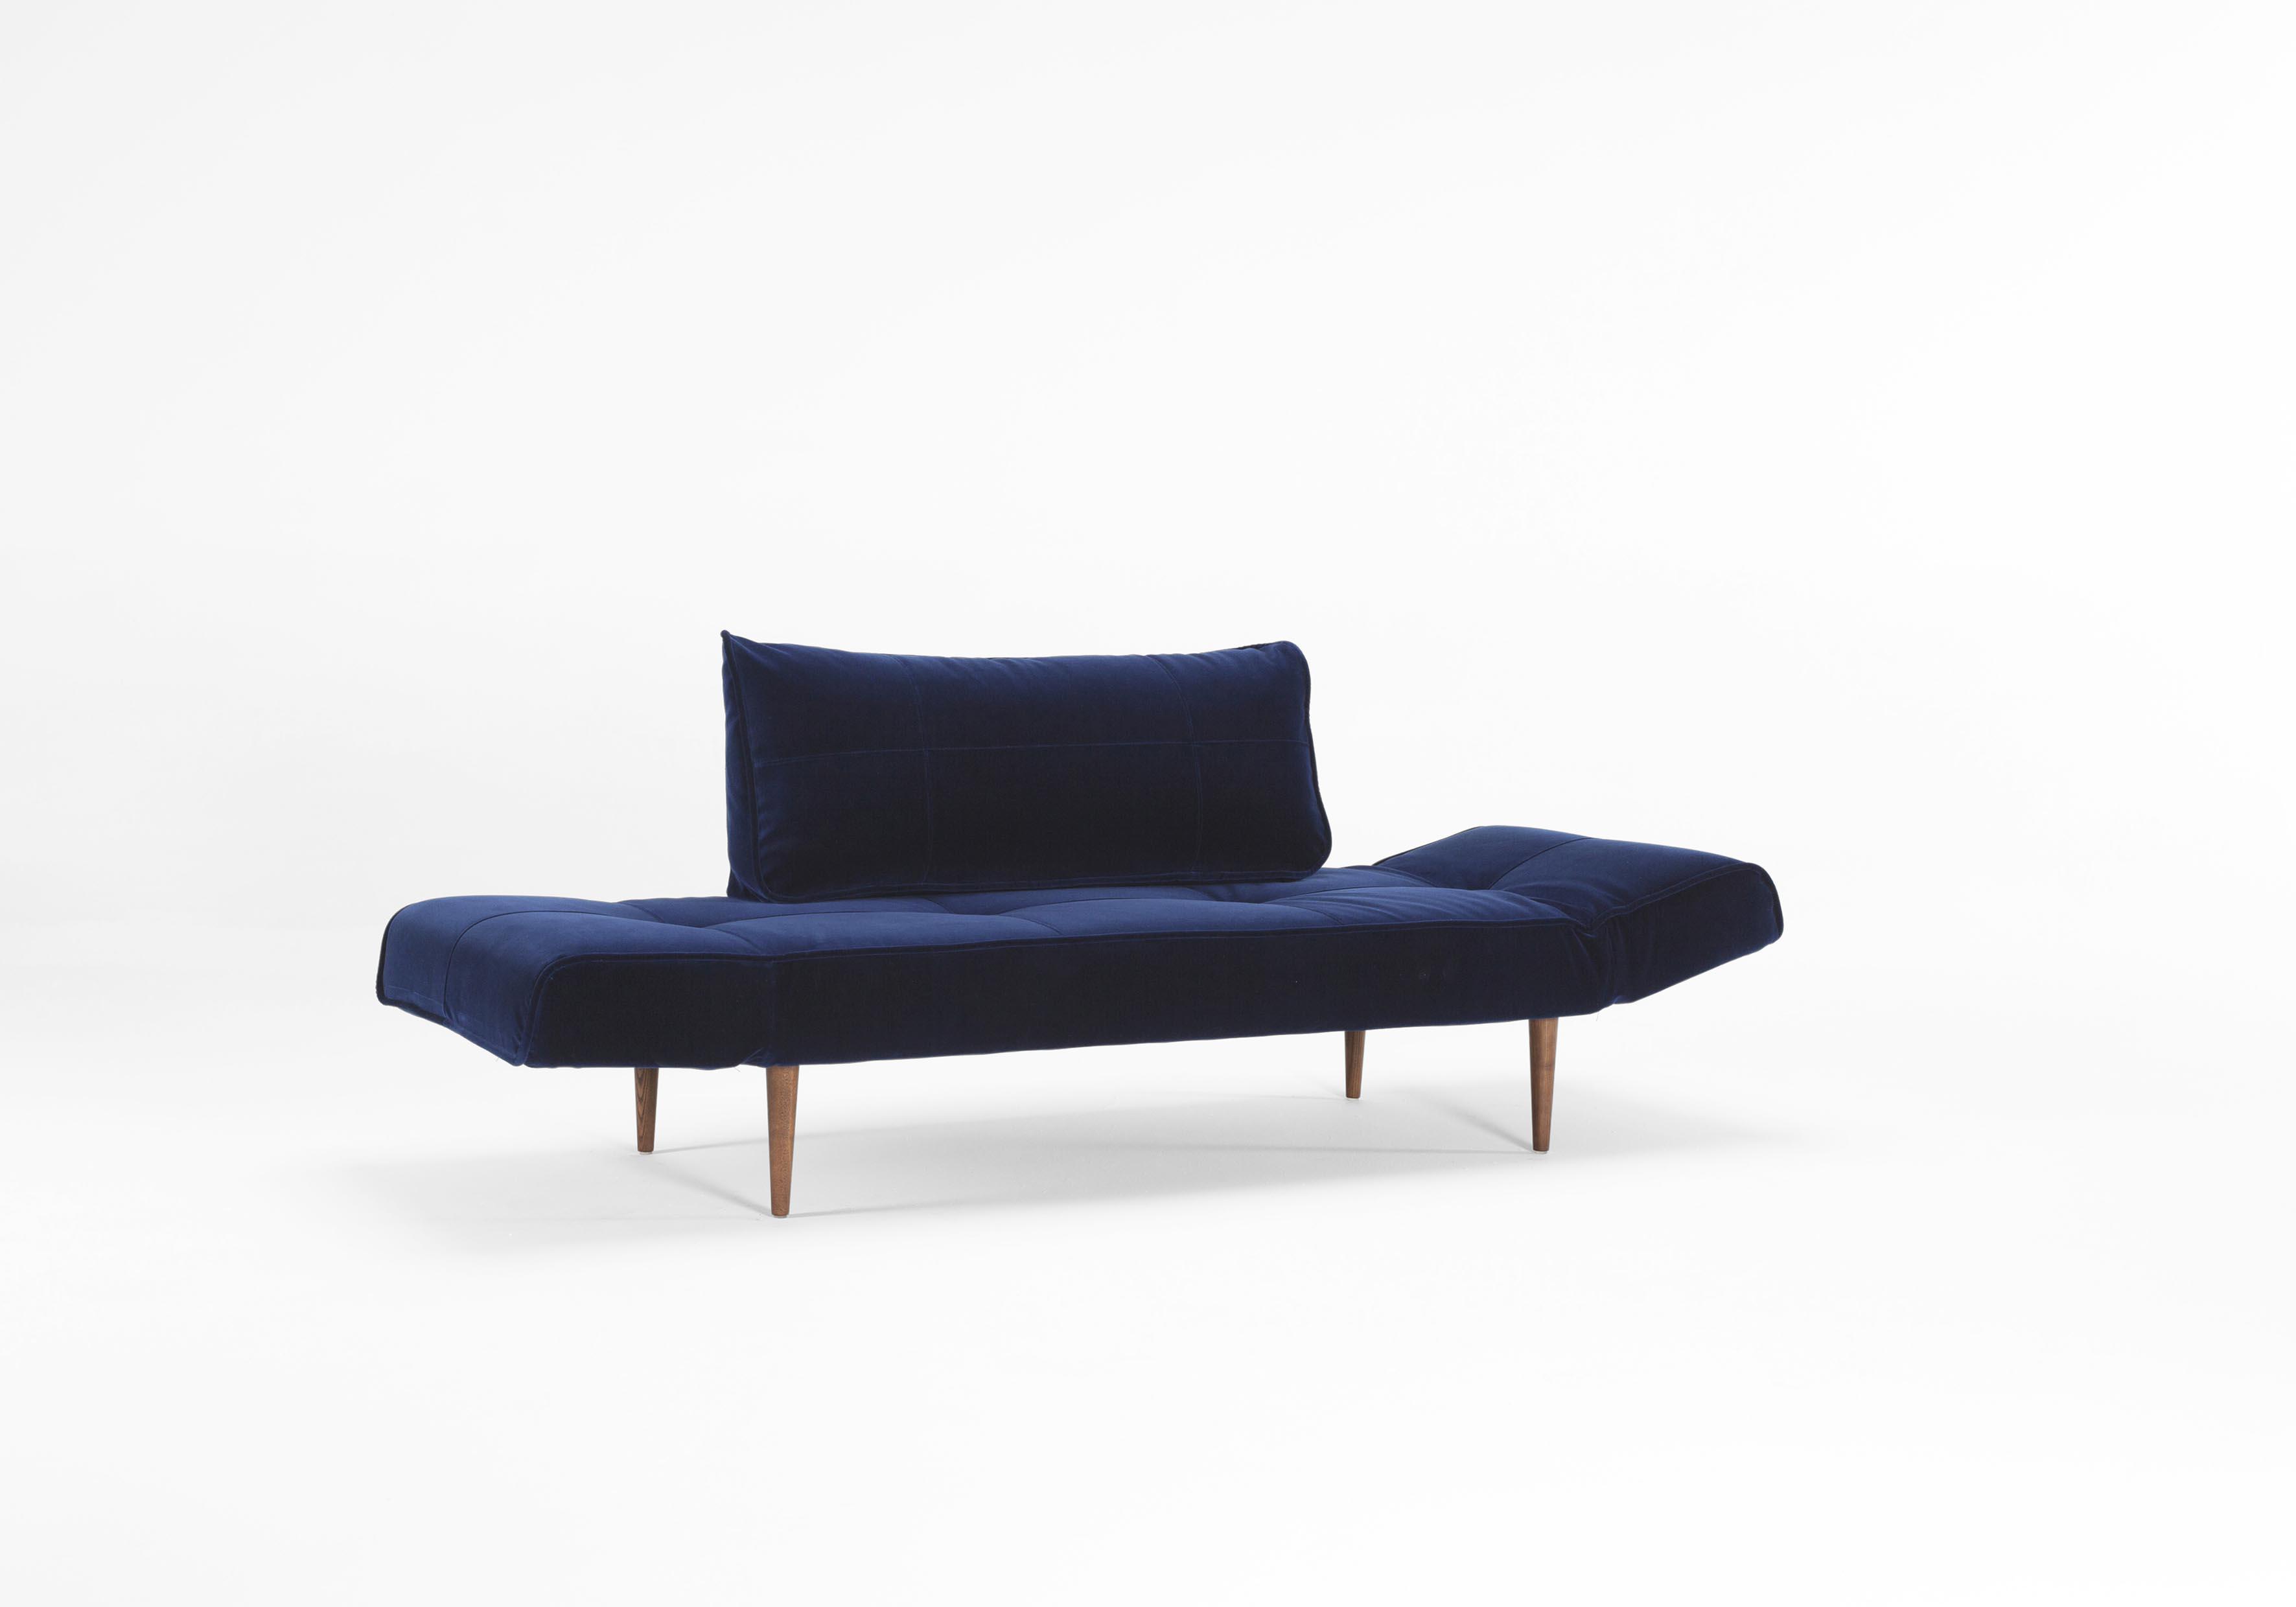 Zeal Deluxe Daybed Vintage Velvet Blue by Innovation